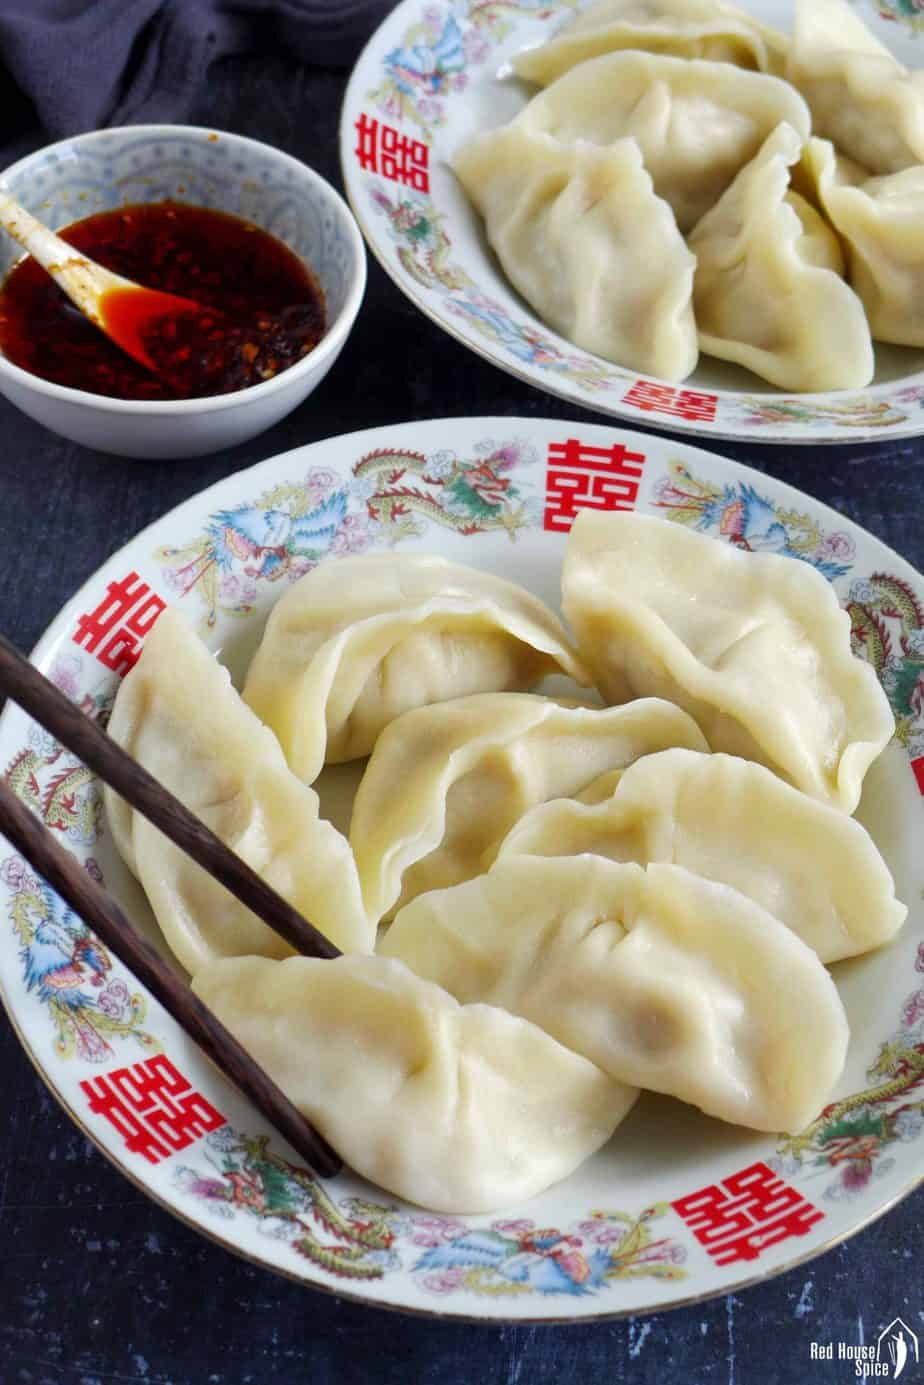 Chinese boiled pork dumplings and chili oil